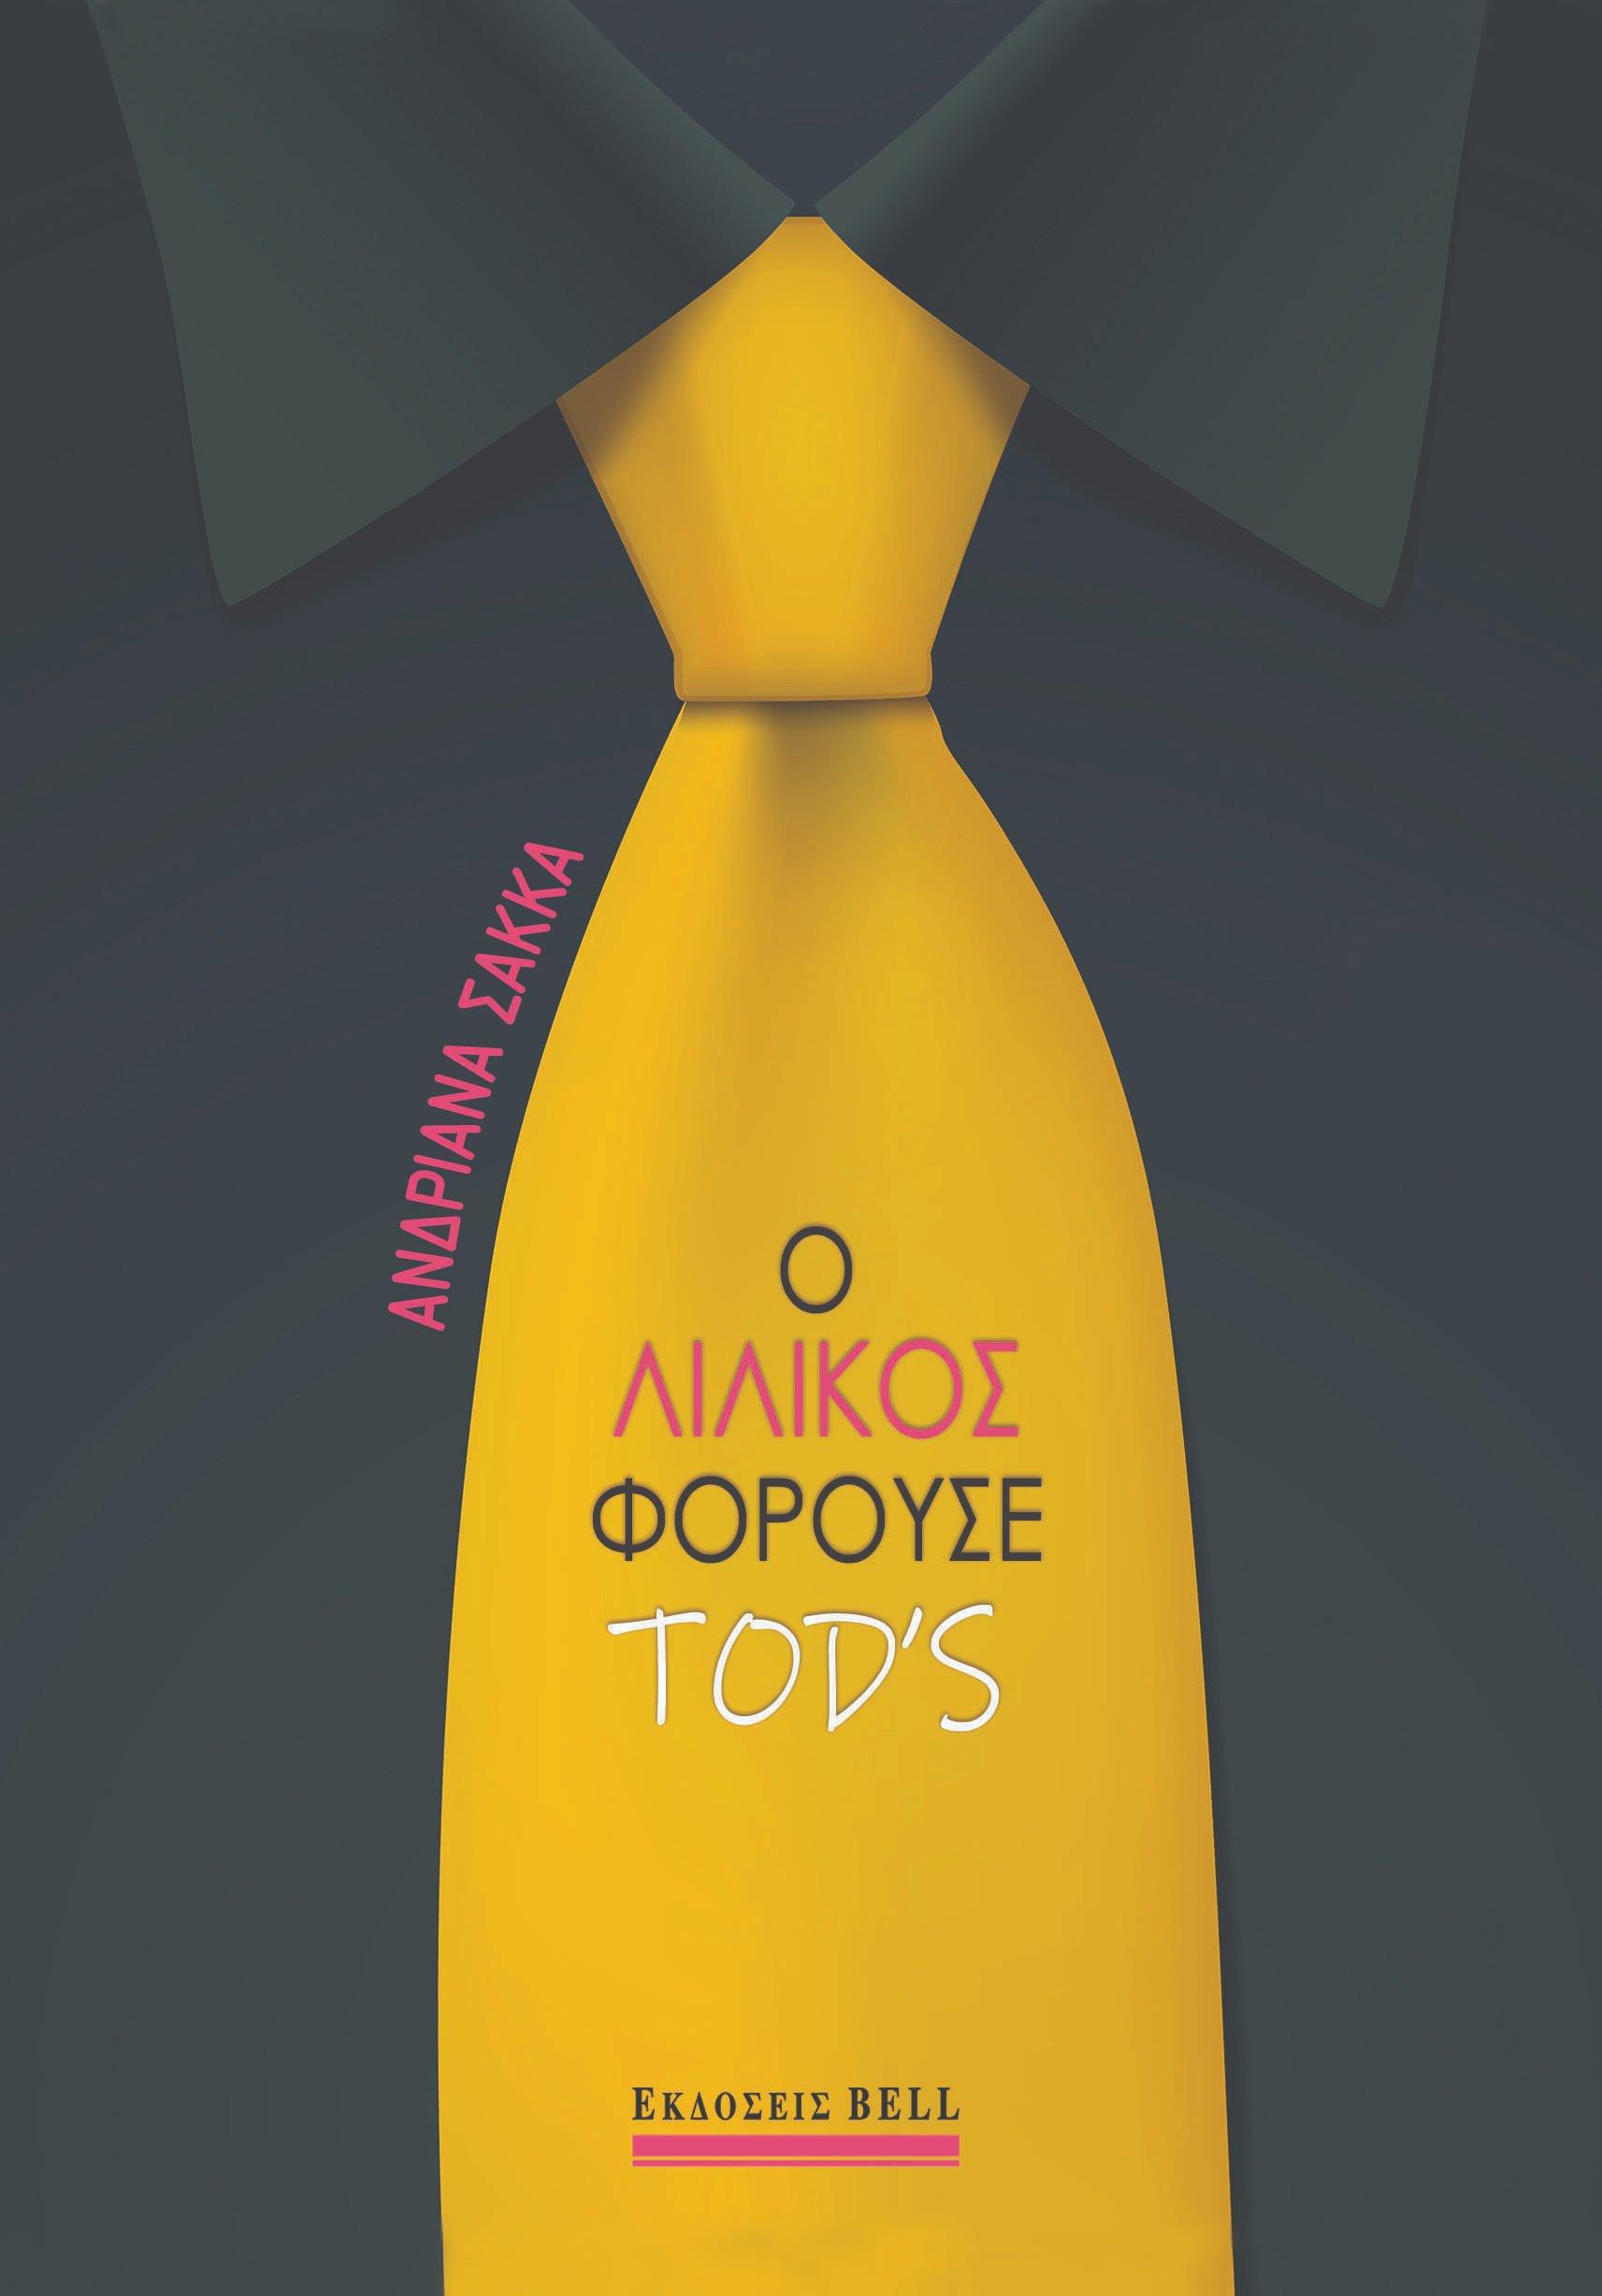 lilikos_book